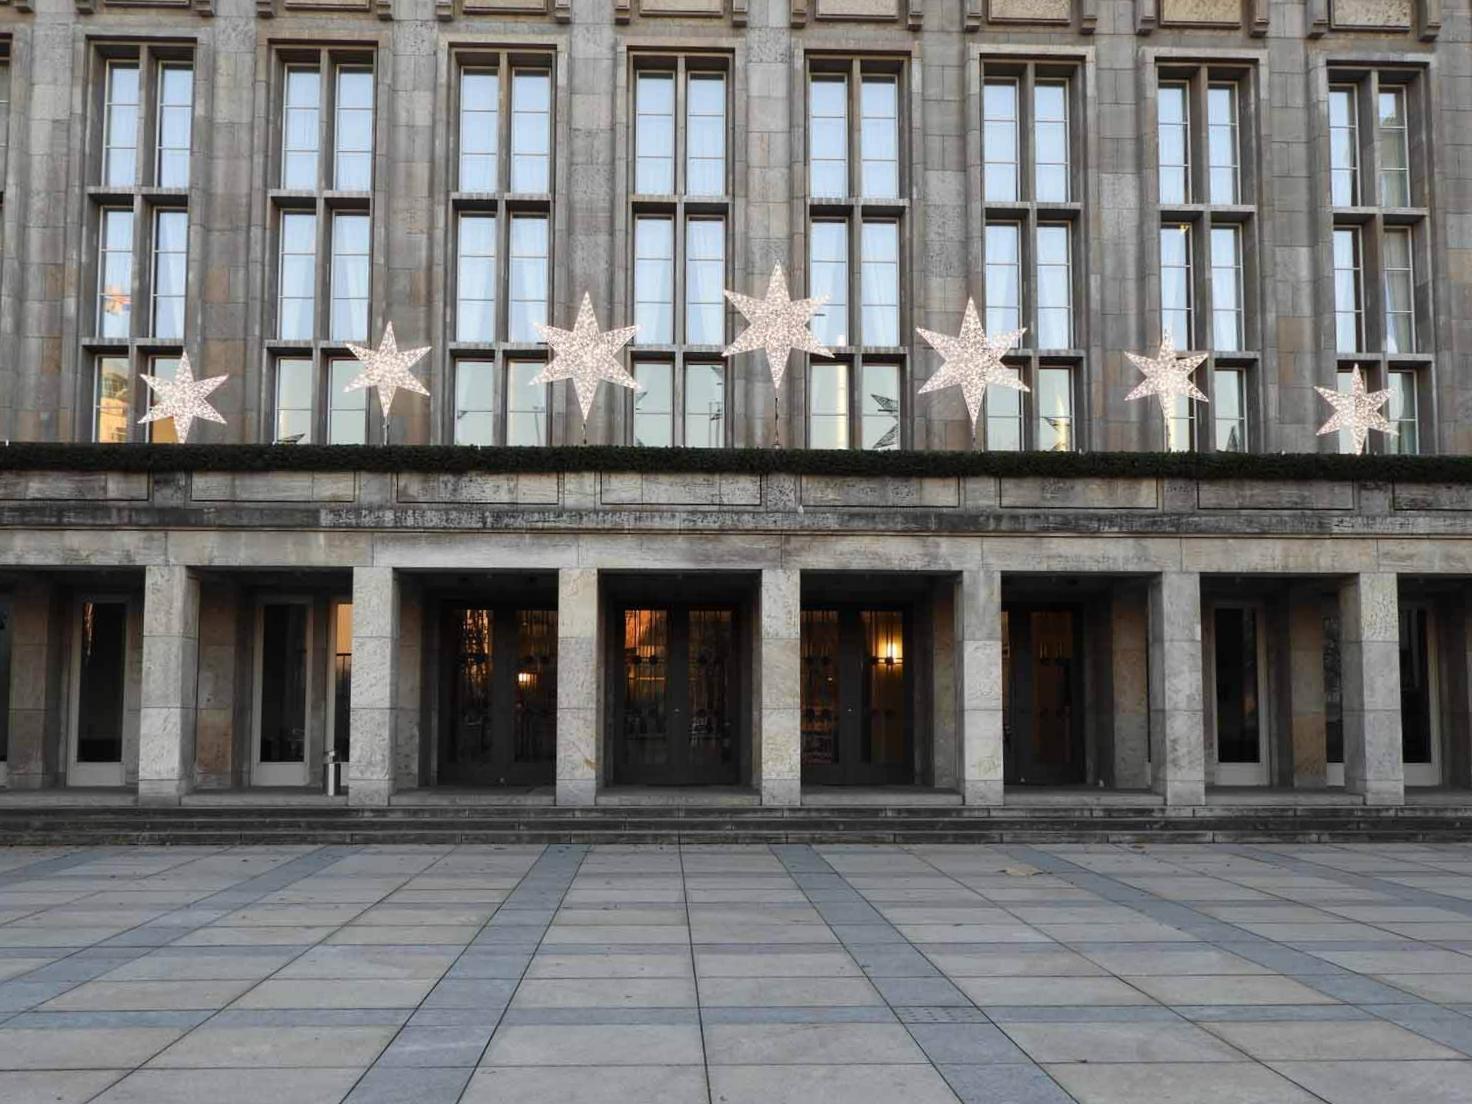 germany-berlin-government-building-stars.JPG